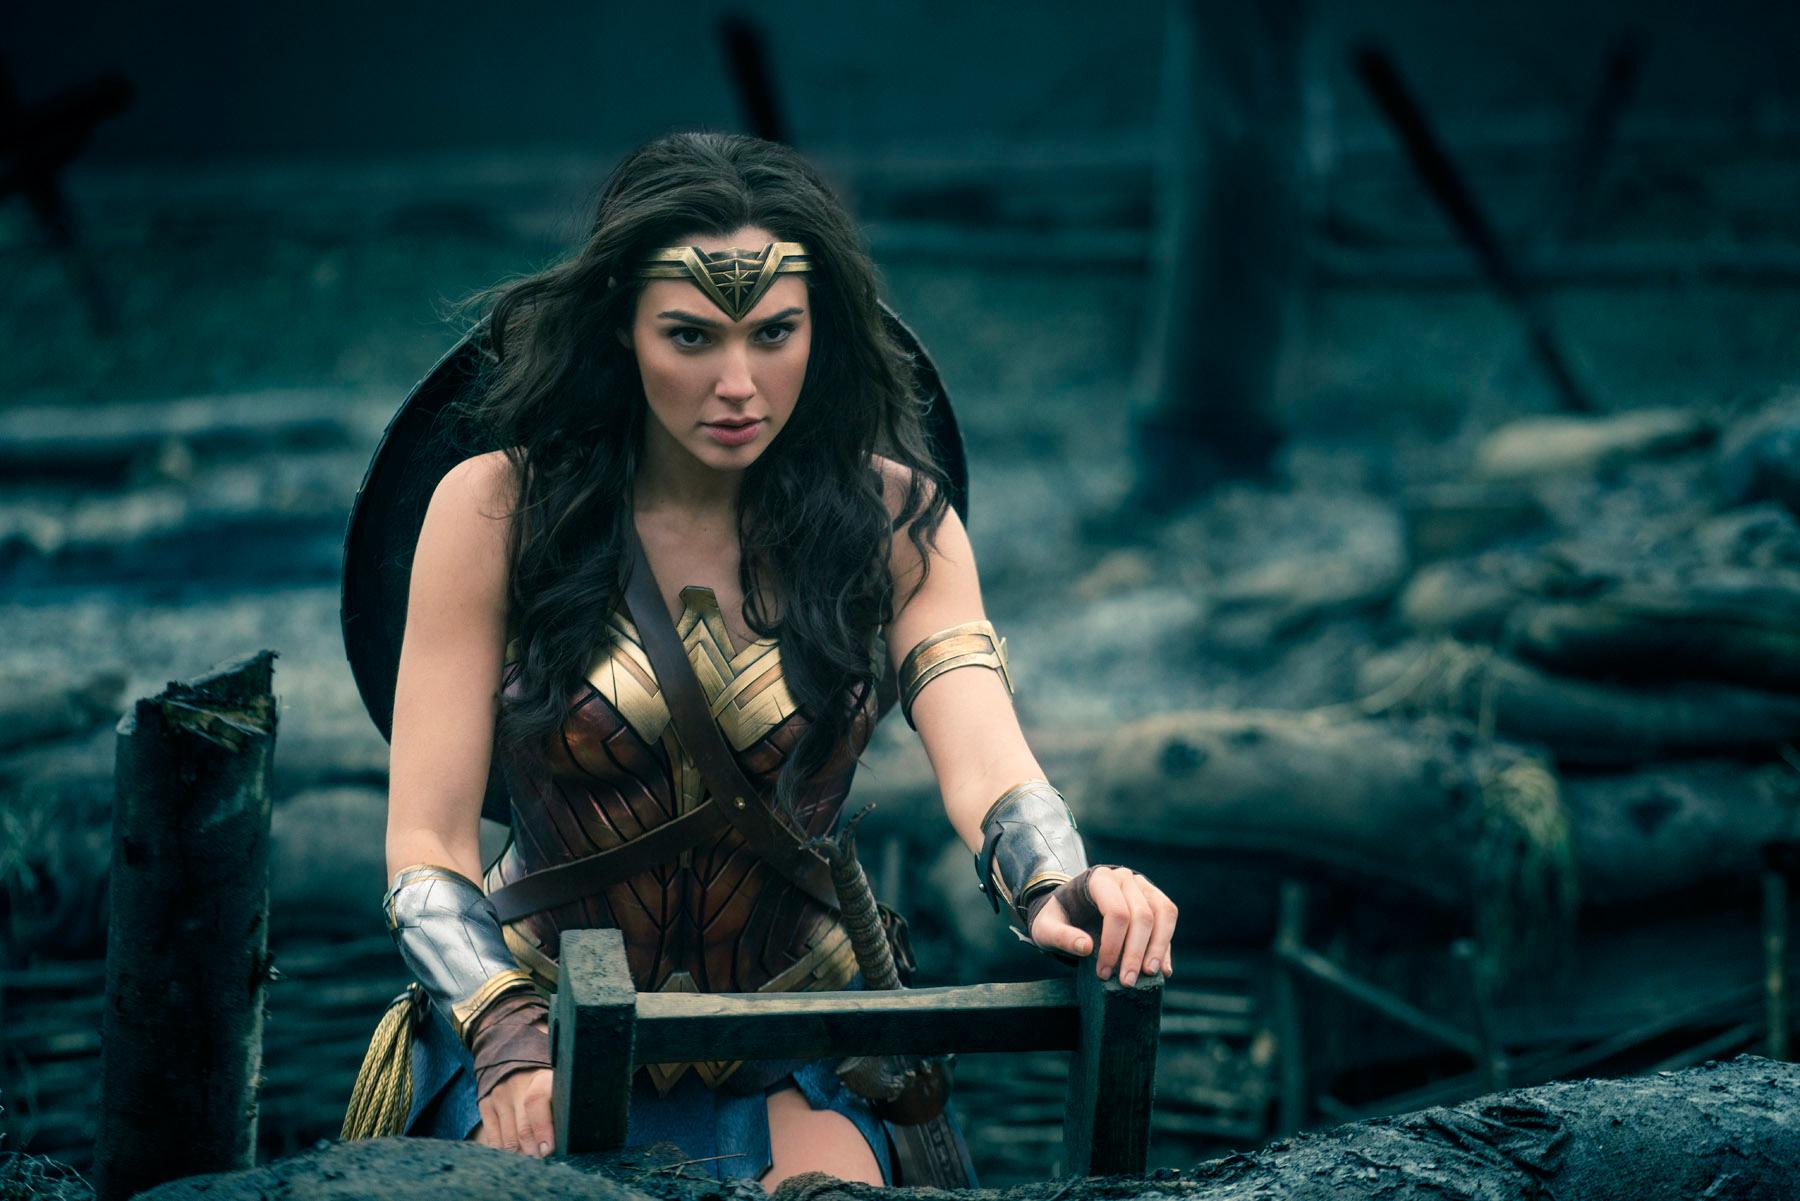 How George Pérez's 1986 'Wonder Woman' Reboot Inspired the 2017 Film